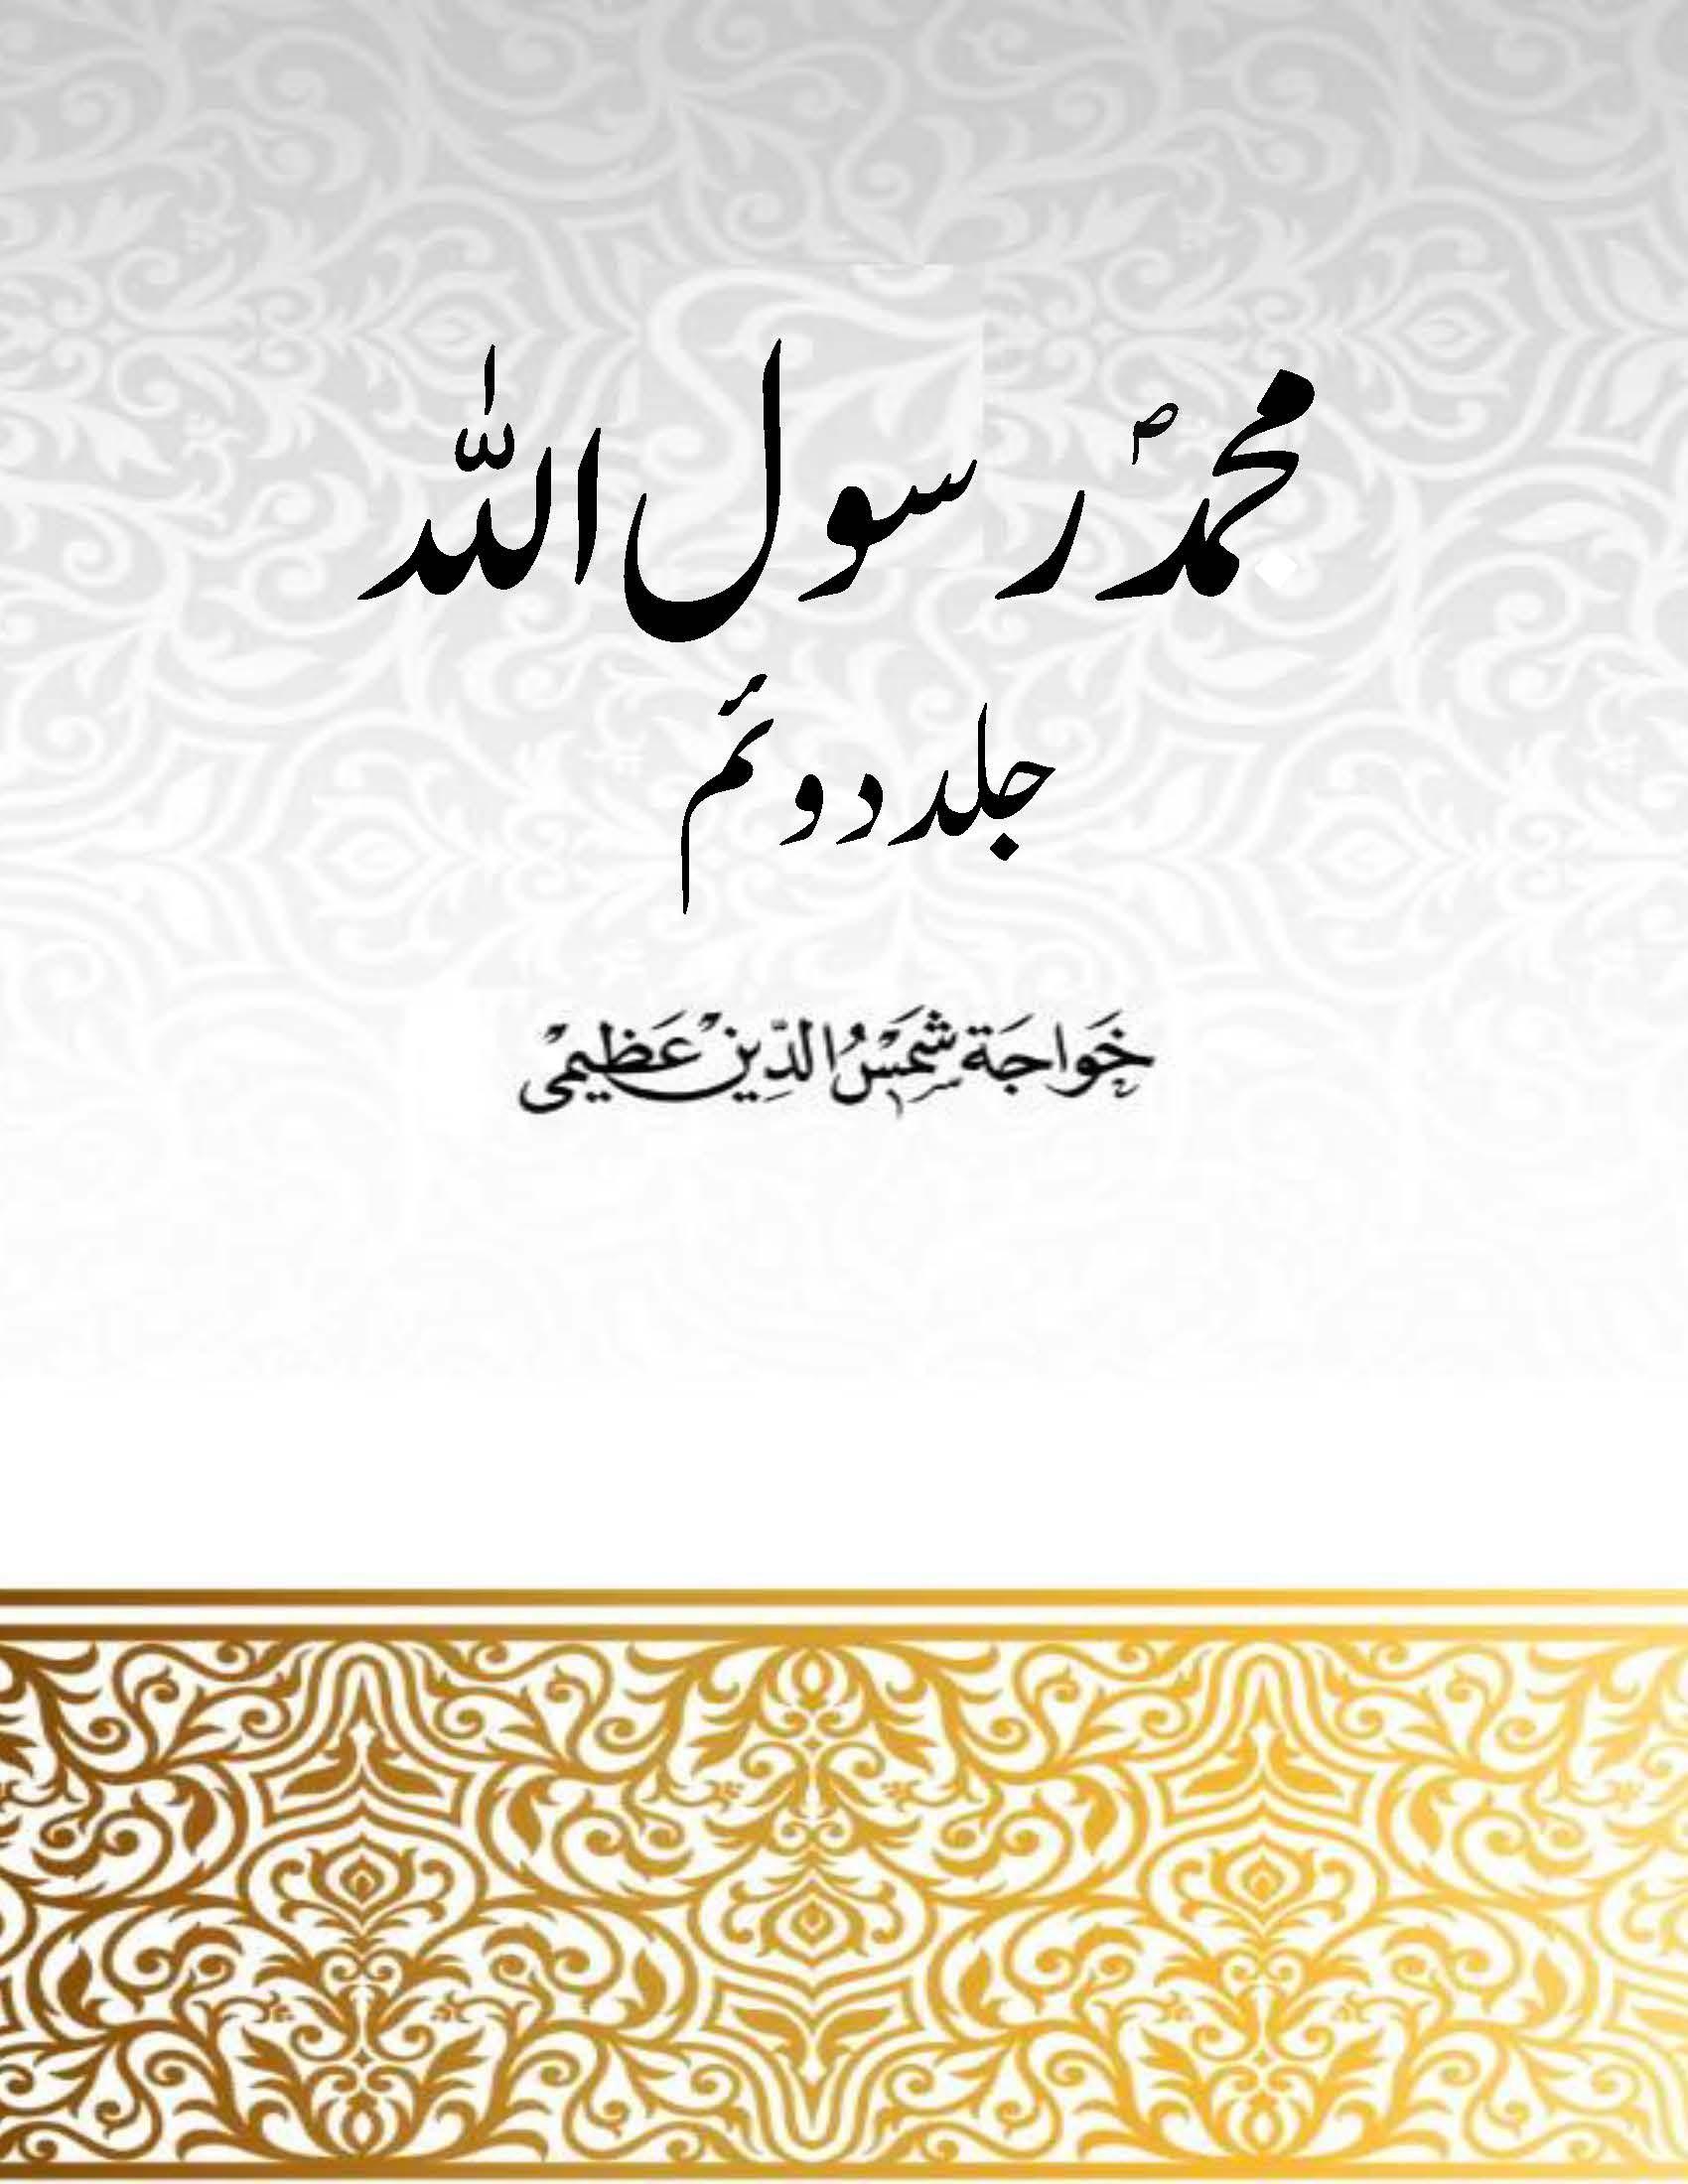 Mohammad Rasool Allah (2)